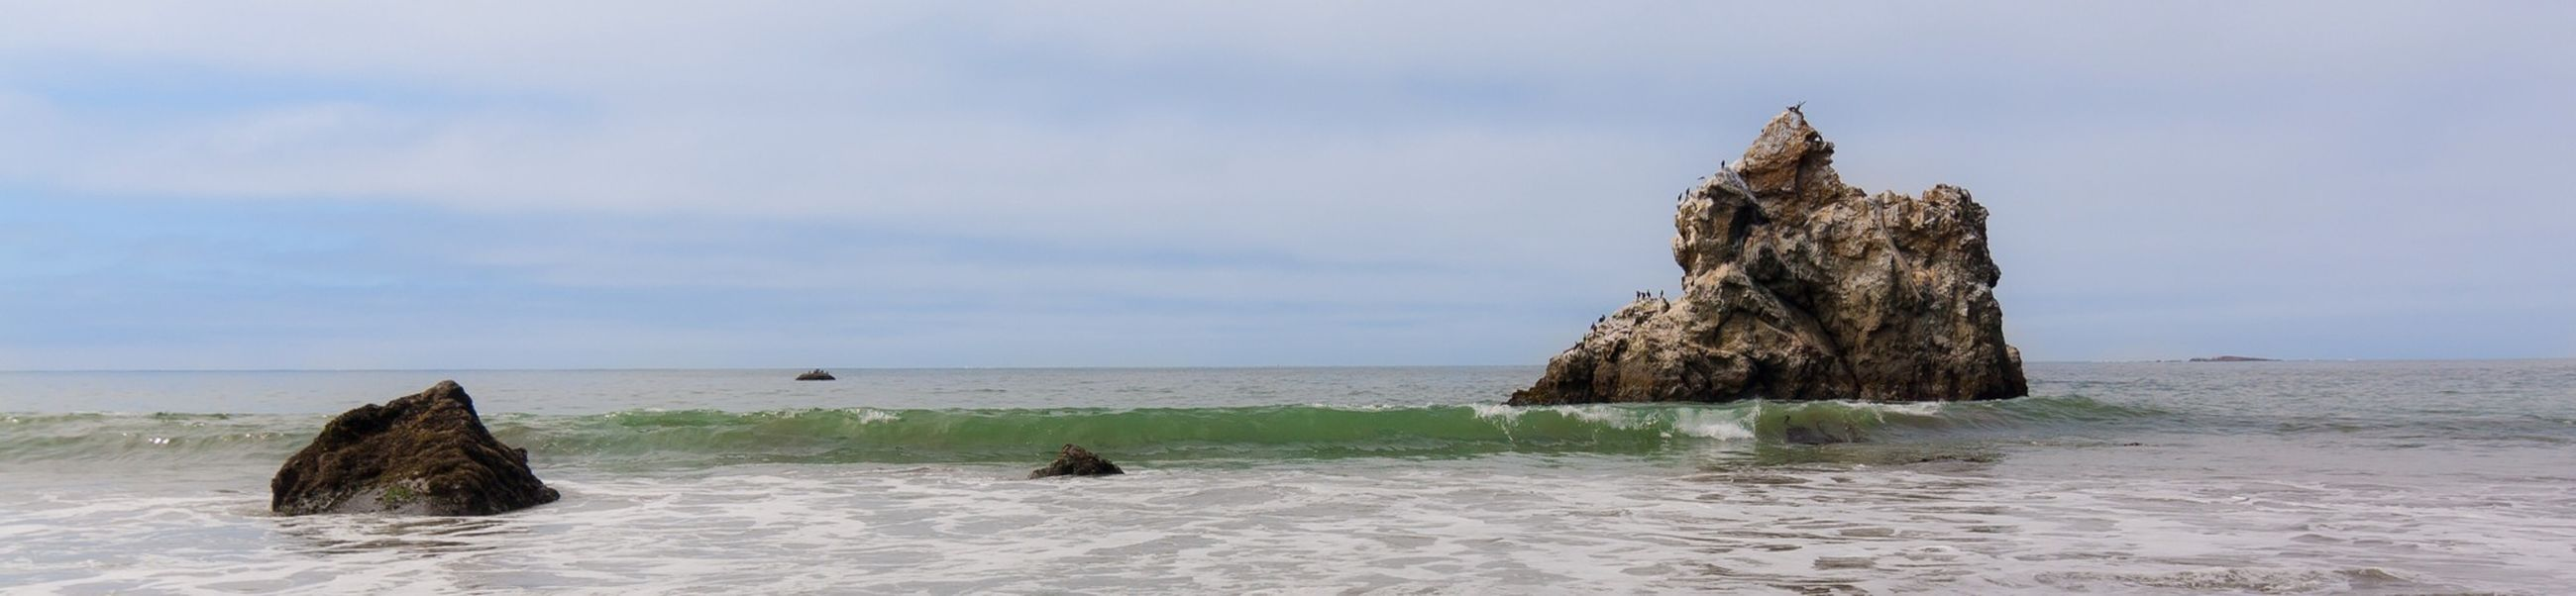 Rock in the Pacific Ocean at Bodega Bay, California. California Landscape Sonomacounty Ocean